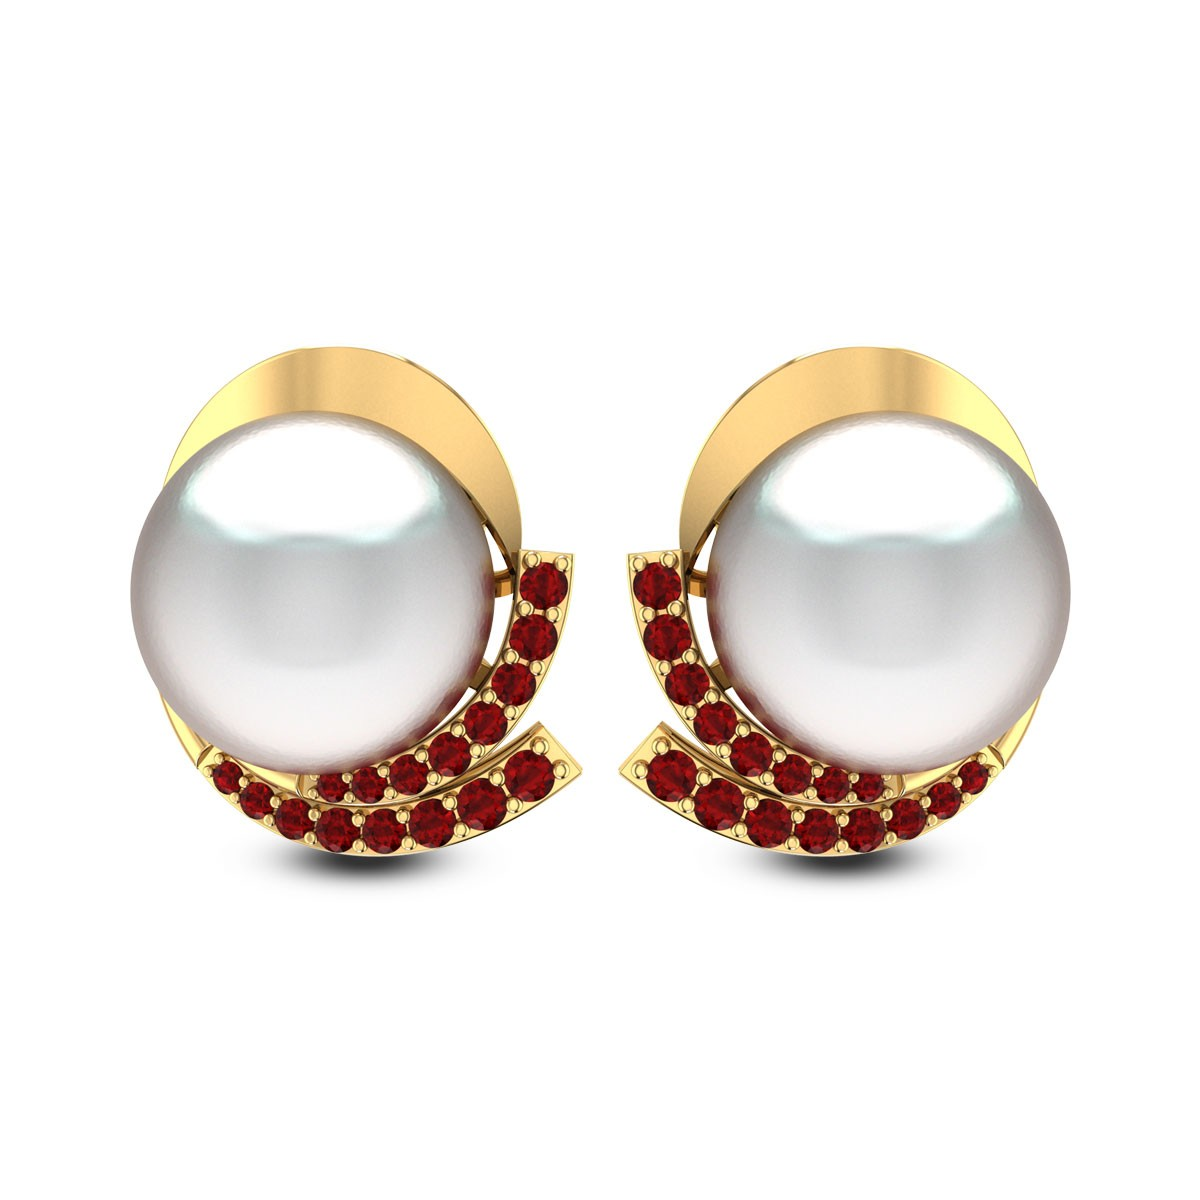 Gaia Gemstone Earrings